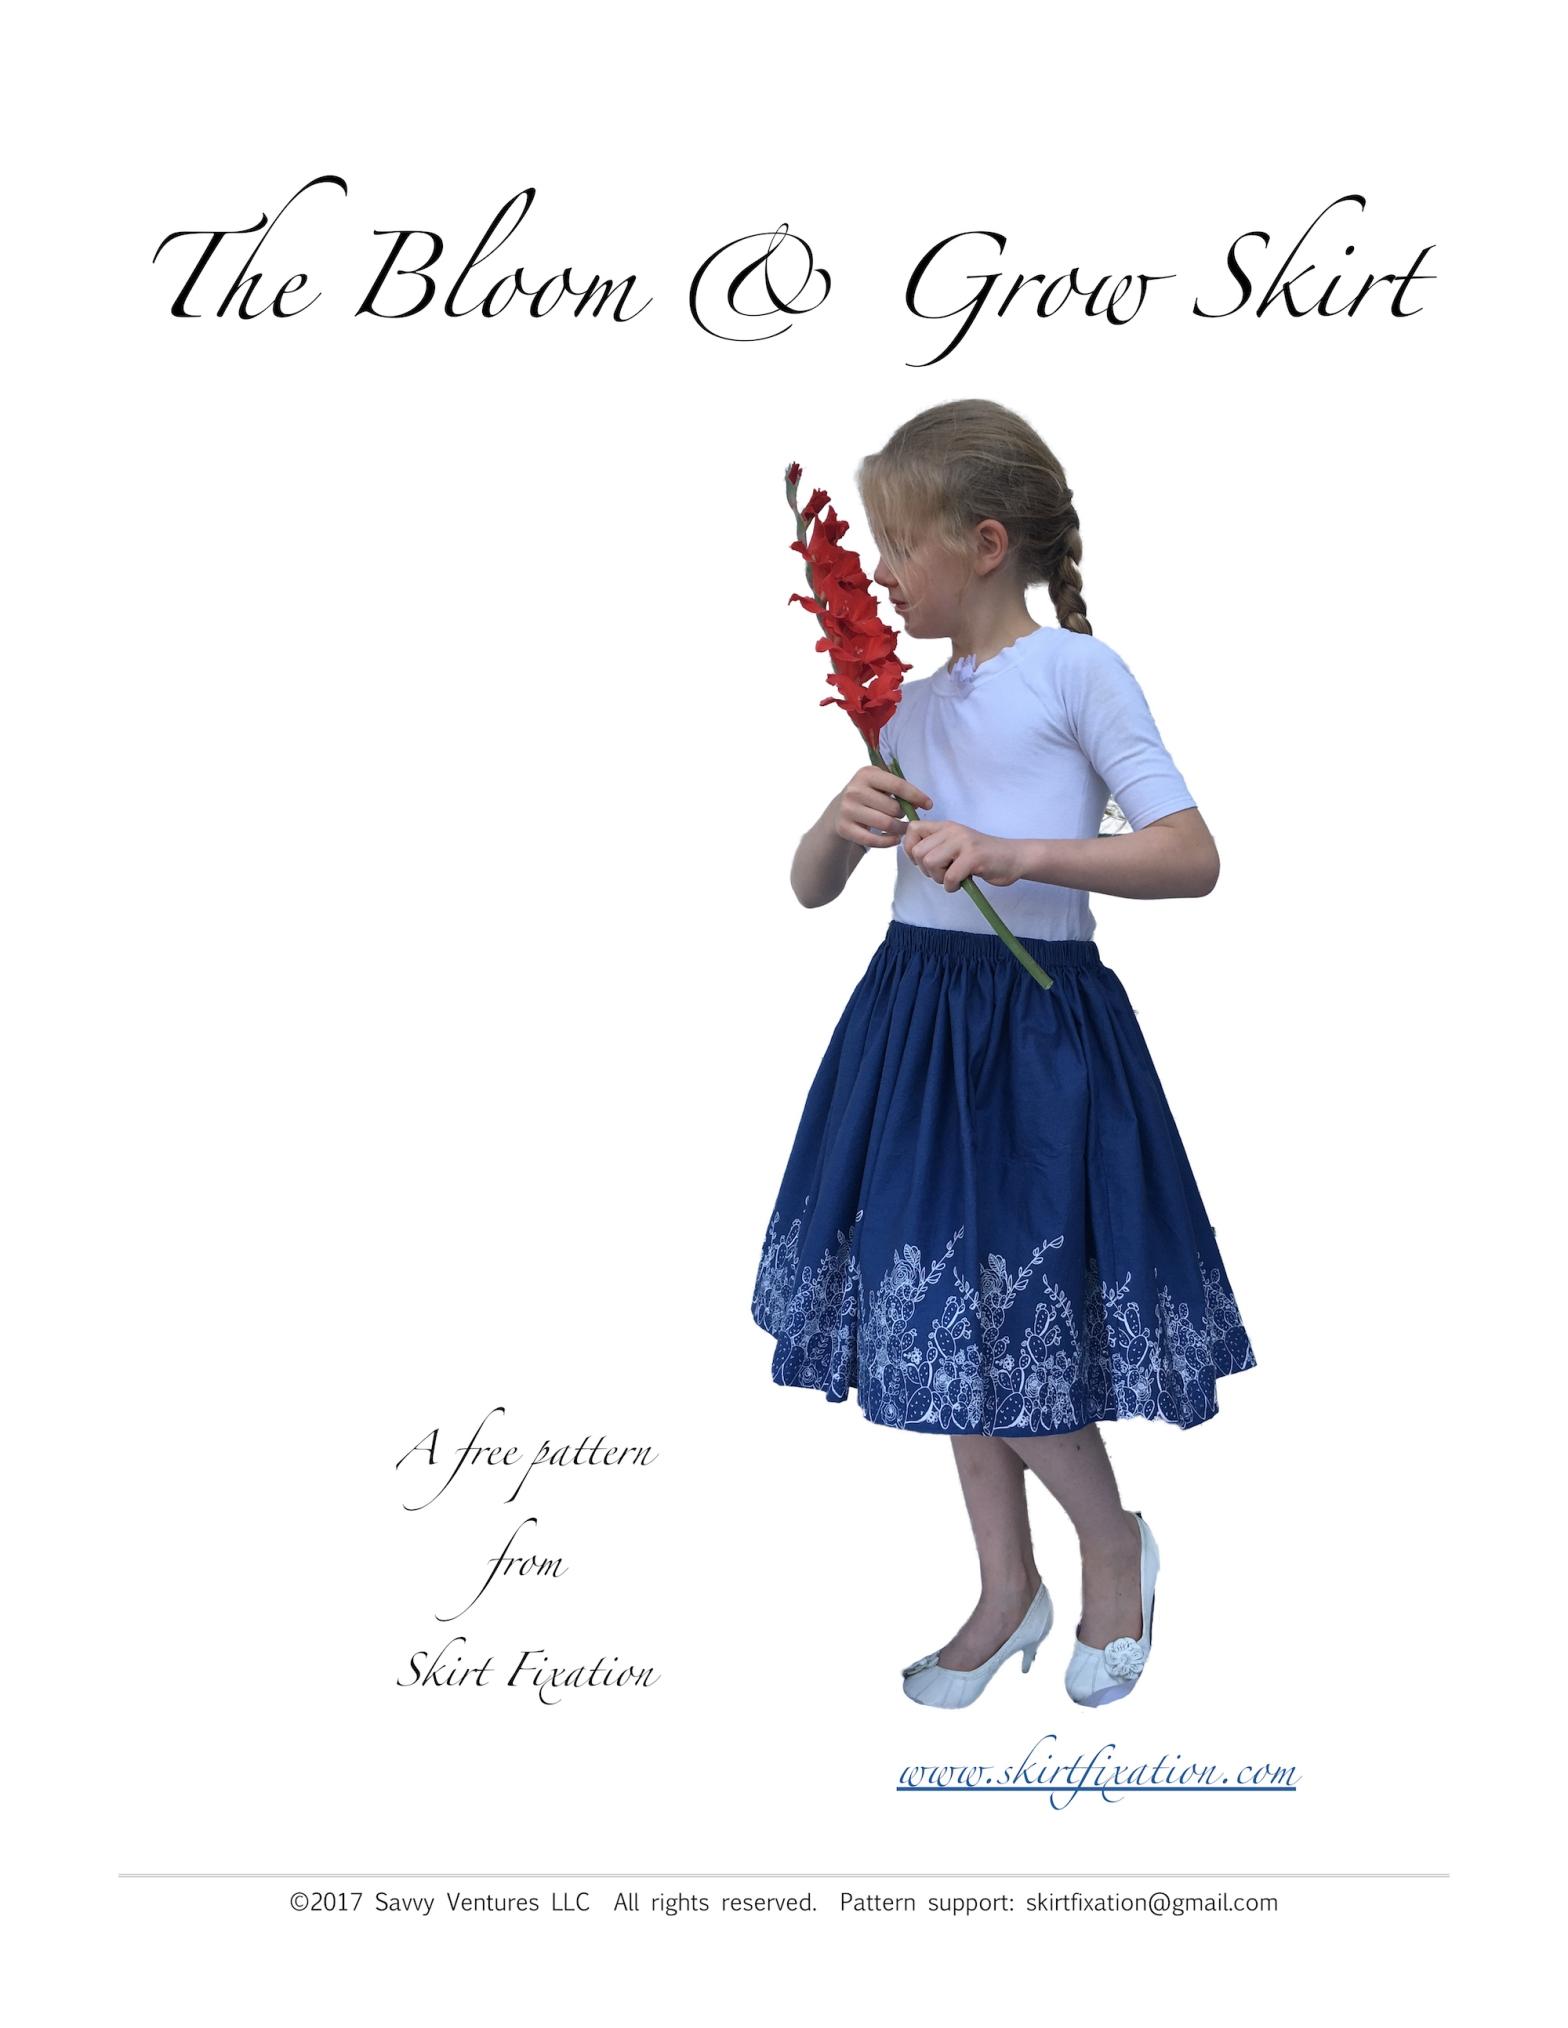 Free girl's Bloom & Grow skirt pattern from Skirt Fixation